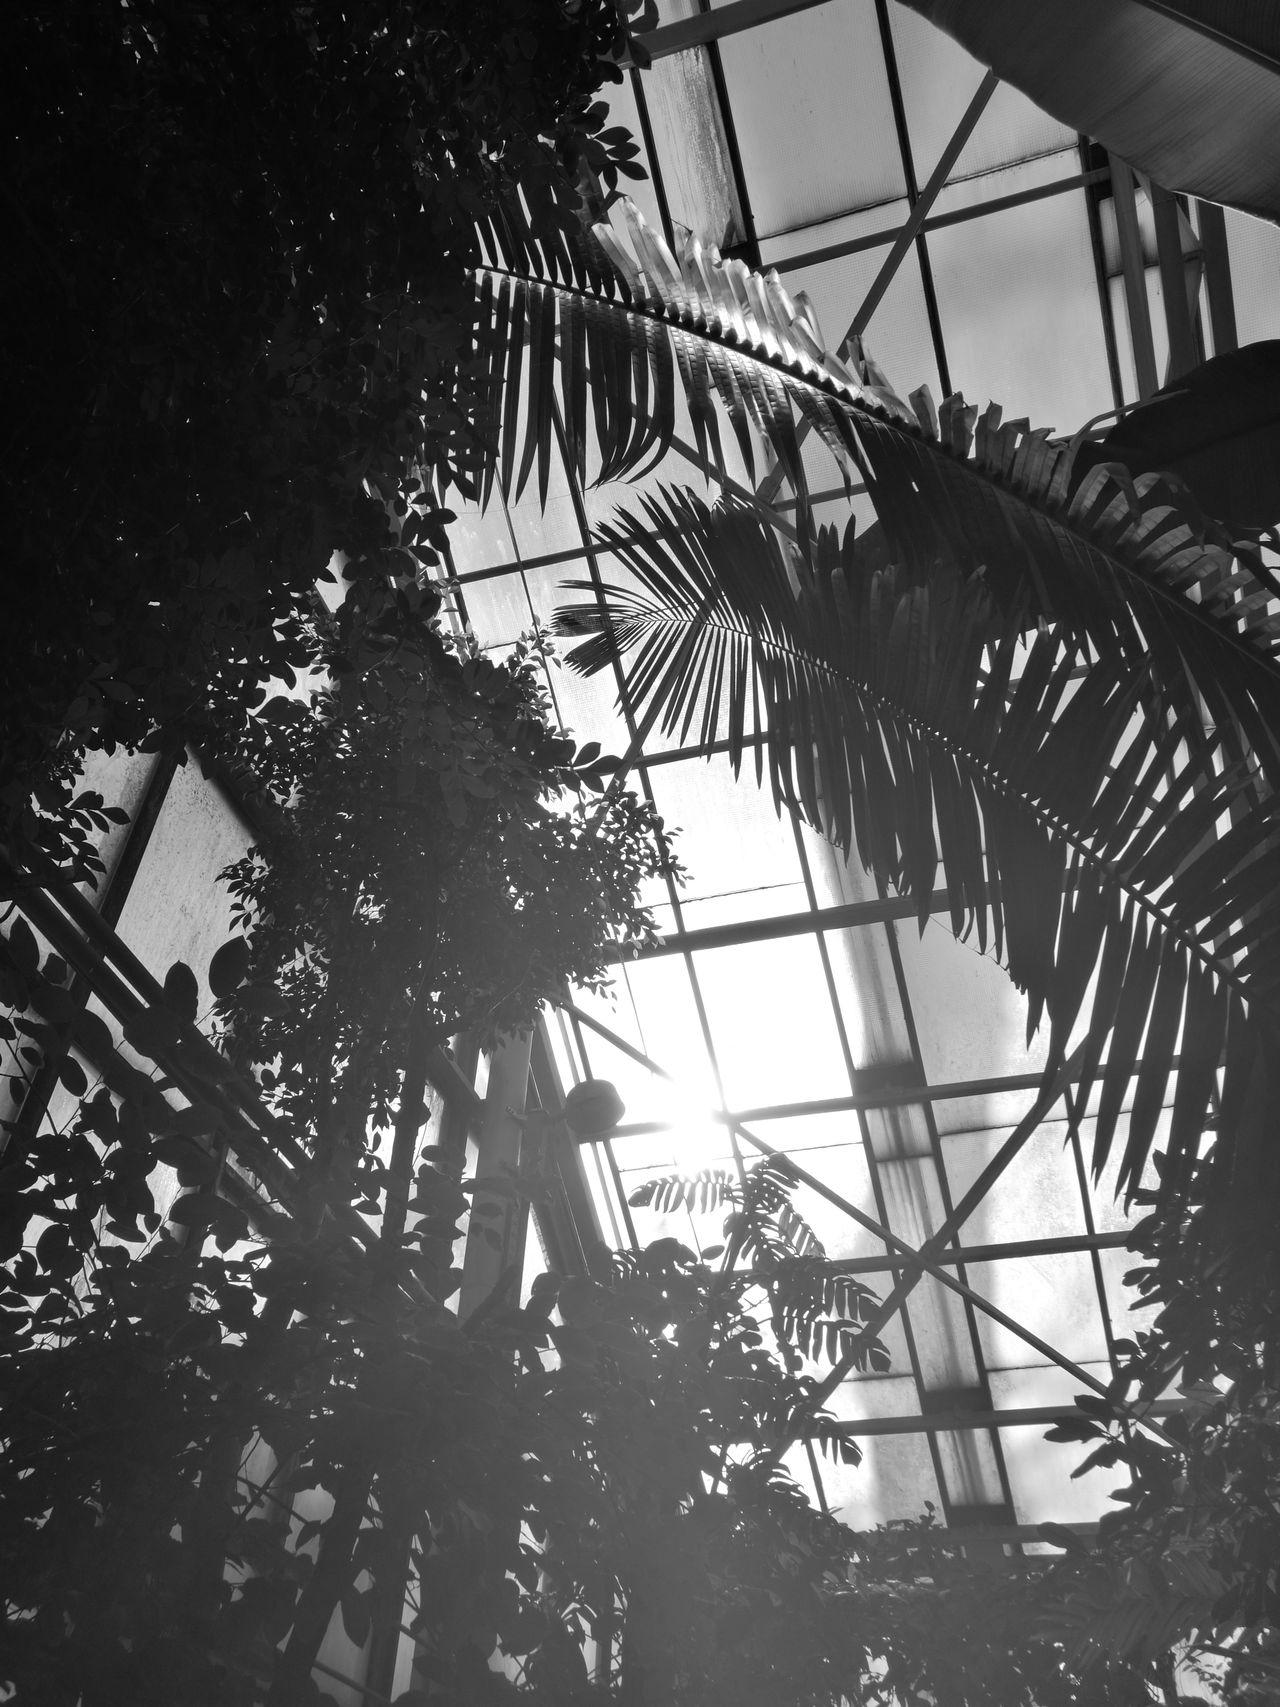 Windows Nature_collection No People Enjoying Nature Beauty In Nature ShadowsContur Arboretum Blackandwhite Contur